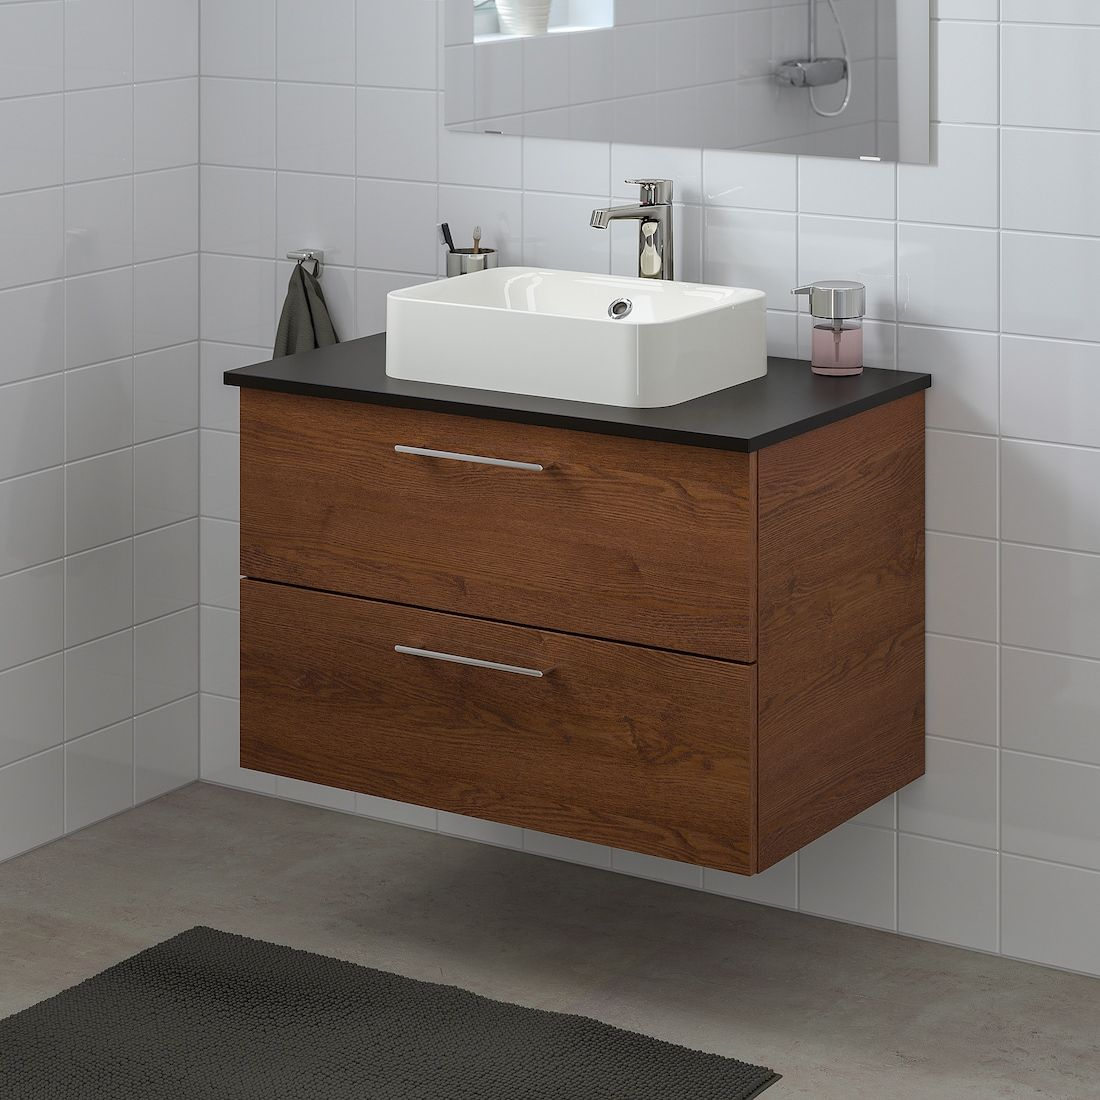 Godmorgon Tolken Horvik Cabinet Top 17 3 4x12 2 8 Sink Brown Stained Ash Effect Anthracite Brogrund Faucet 32 1 4x19 1 4x28 3 8 Ikea In 2021 Ikea Godmorgon Bathroom Vanity Vanity